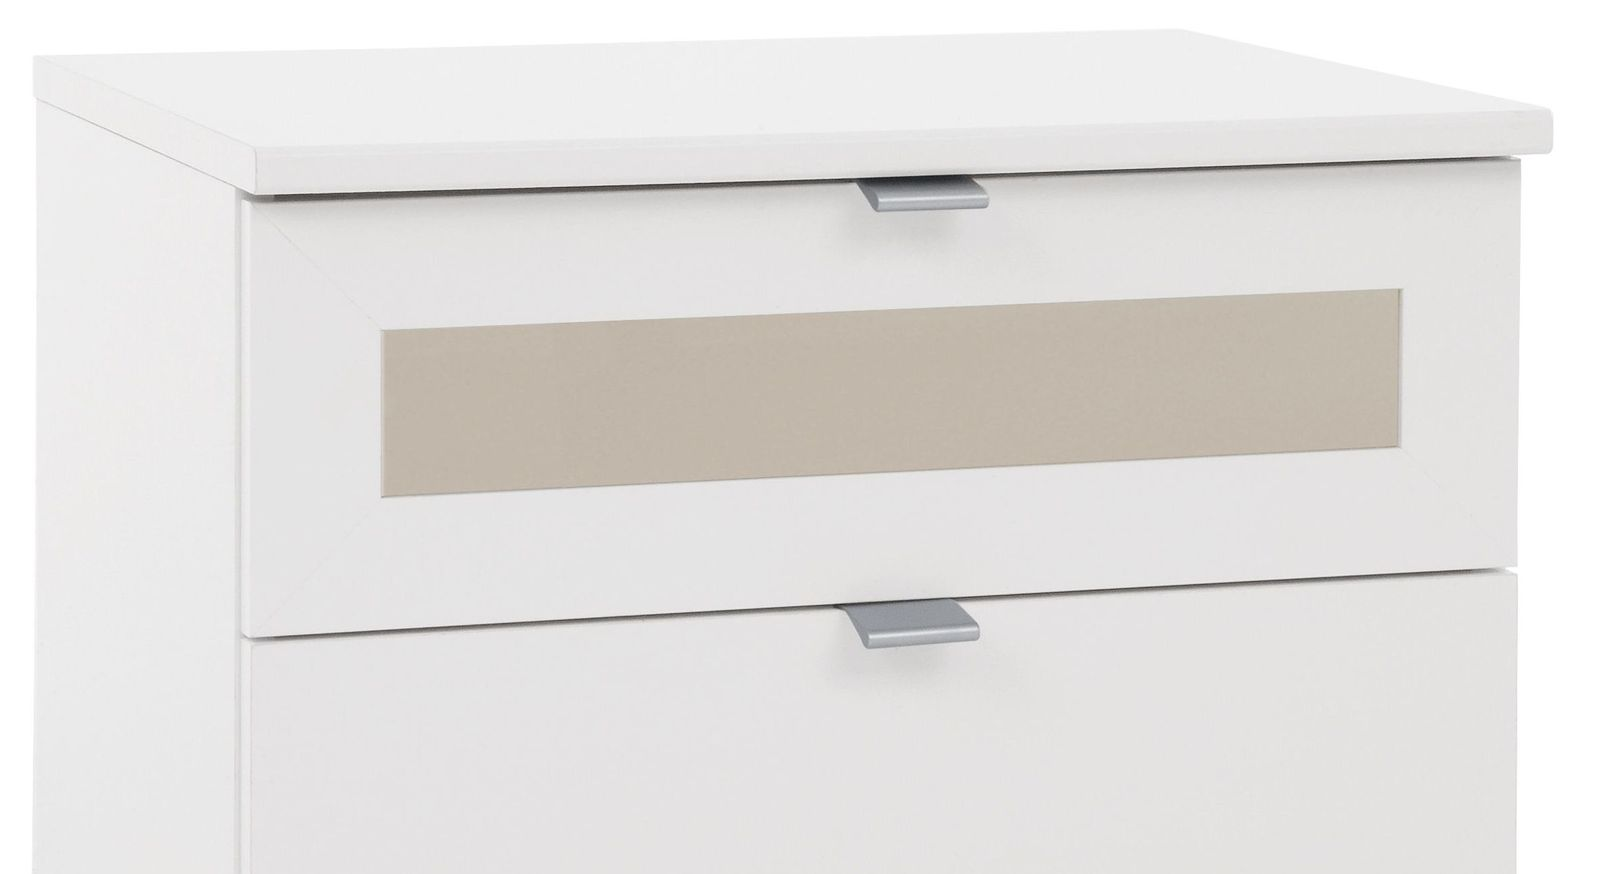 nachttisch mit glasplatte awesome ikea malm nachttisch kommode mit glasplatte in weilersbach. Black Bedroom Furniture Sets. Home Design Ideas